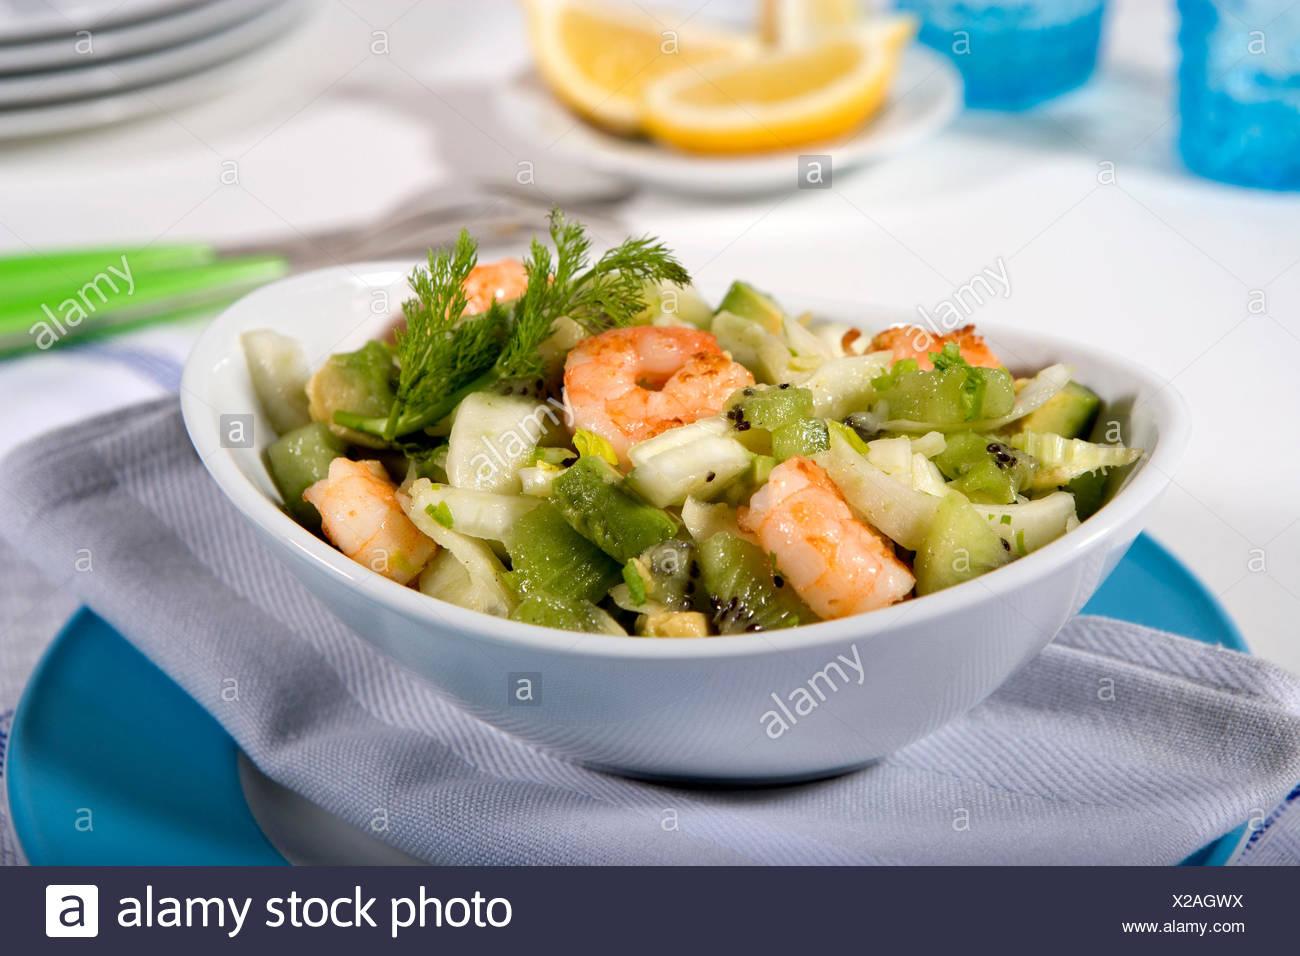 Oriental fennel salad with shrimps - Stock Image